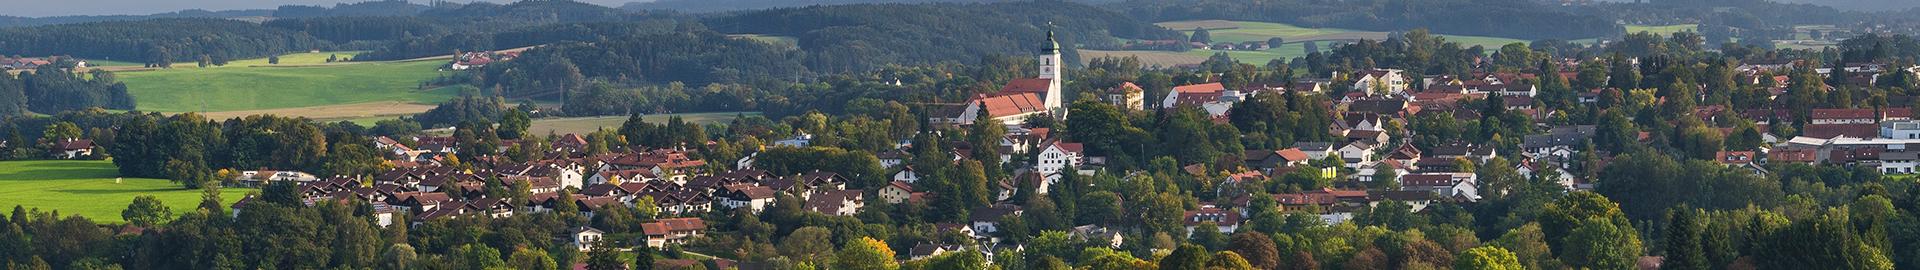 Panorama über Ebersberg vom Aussichtsturm aus